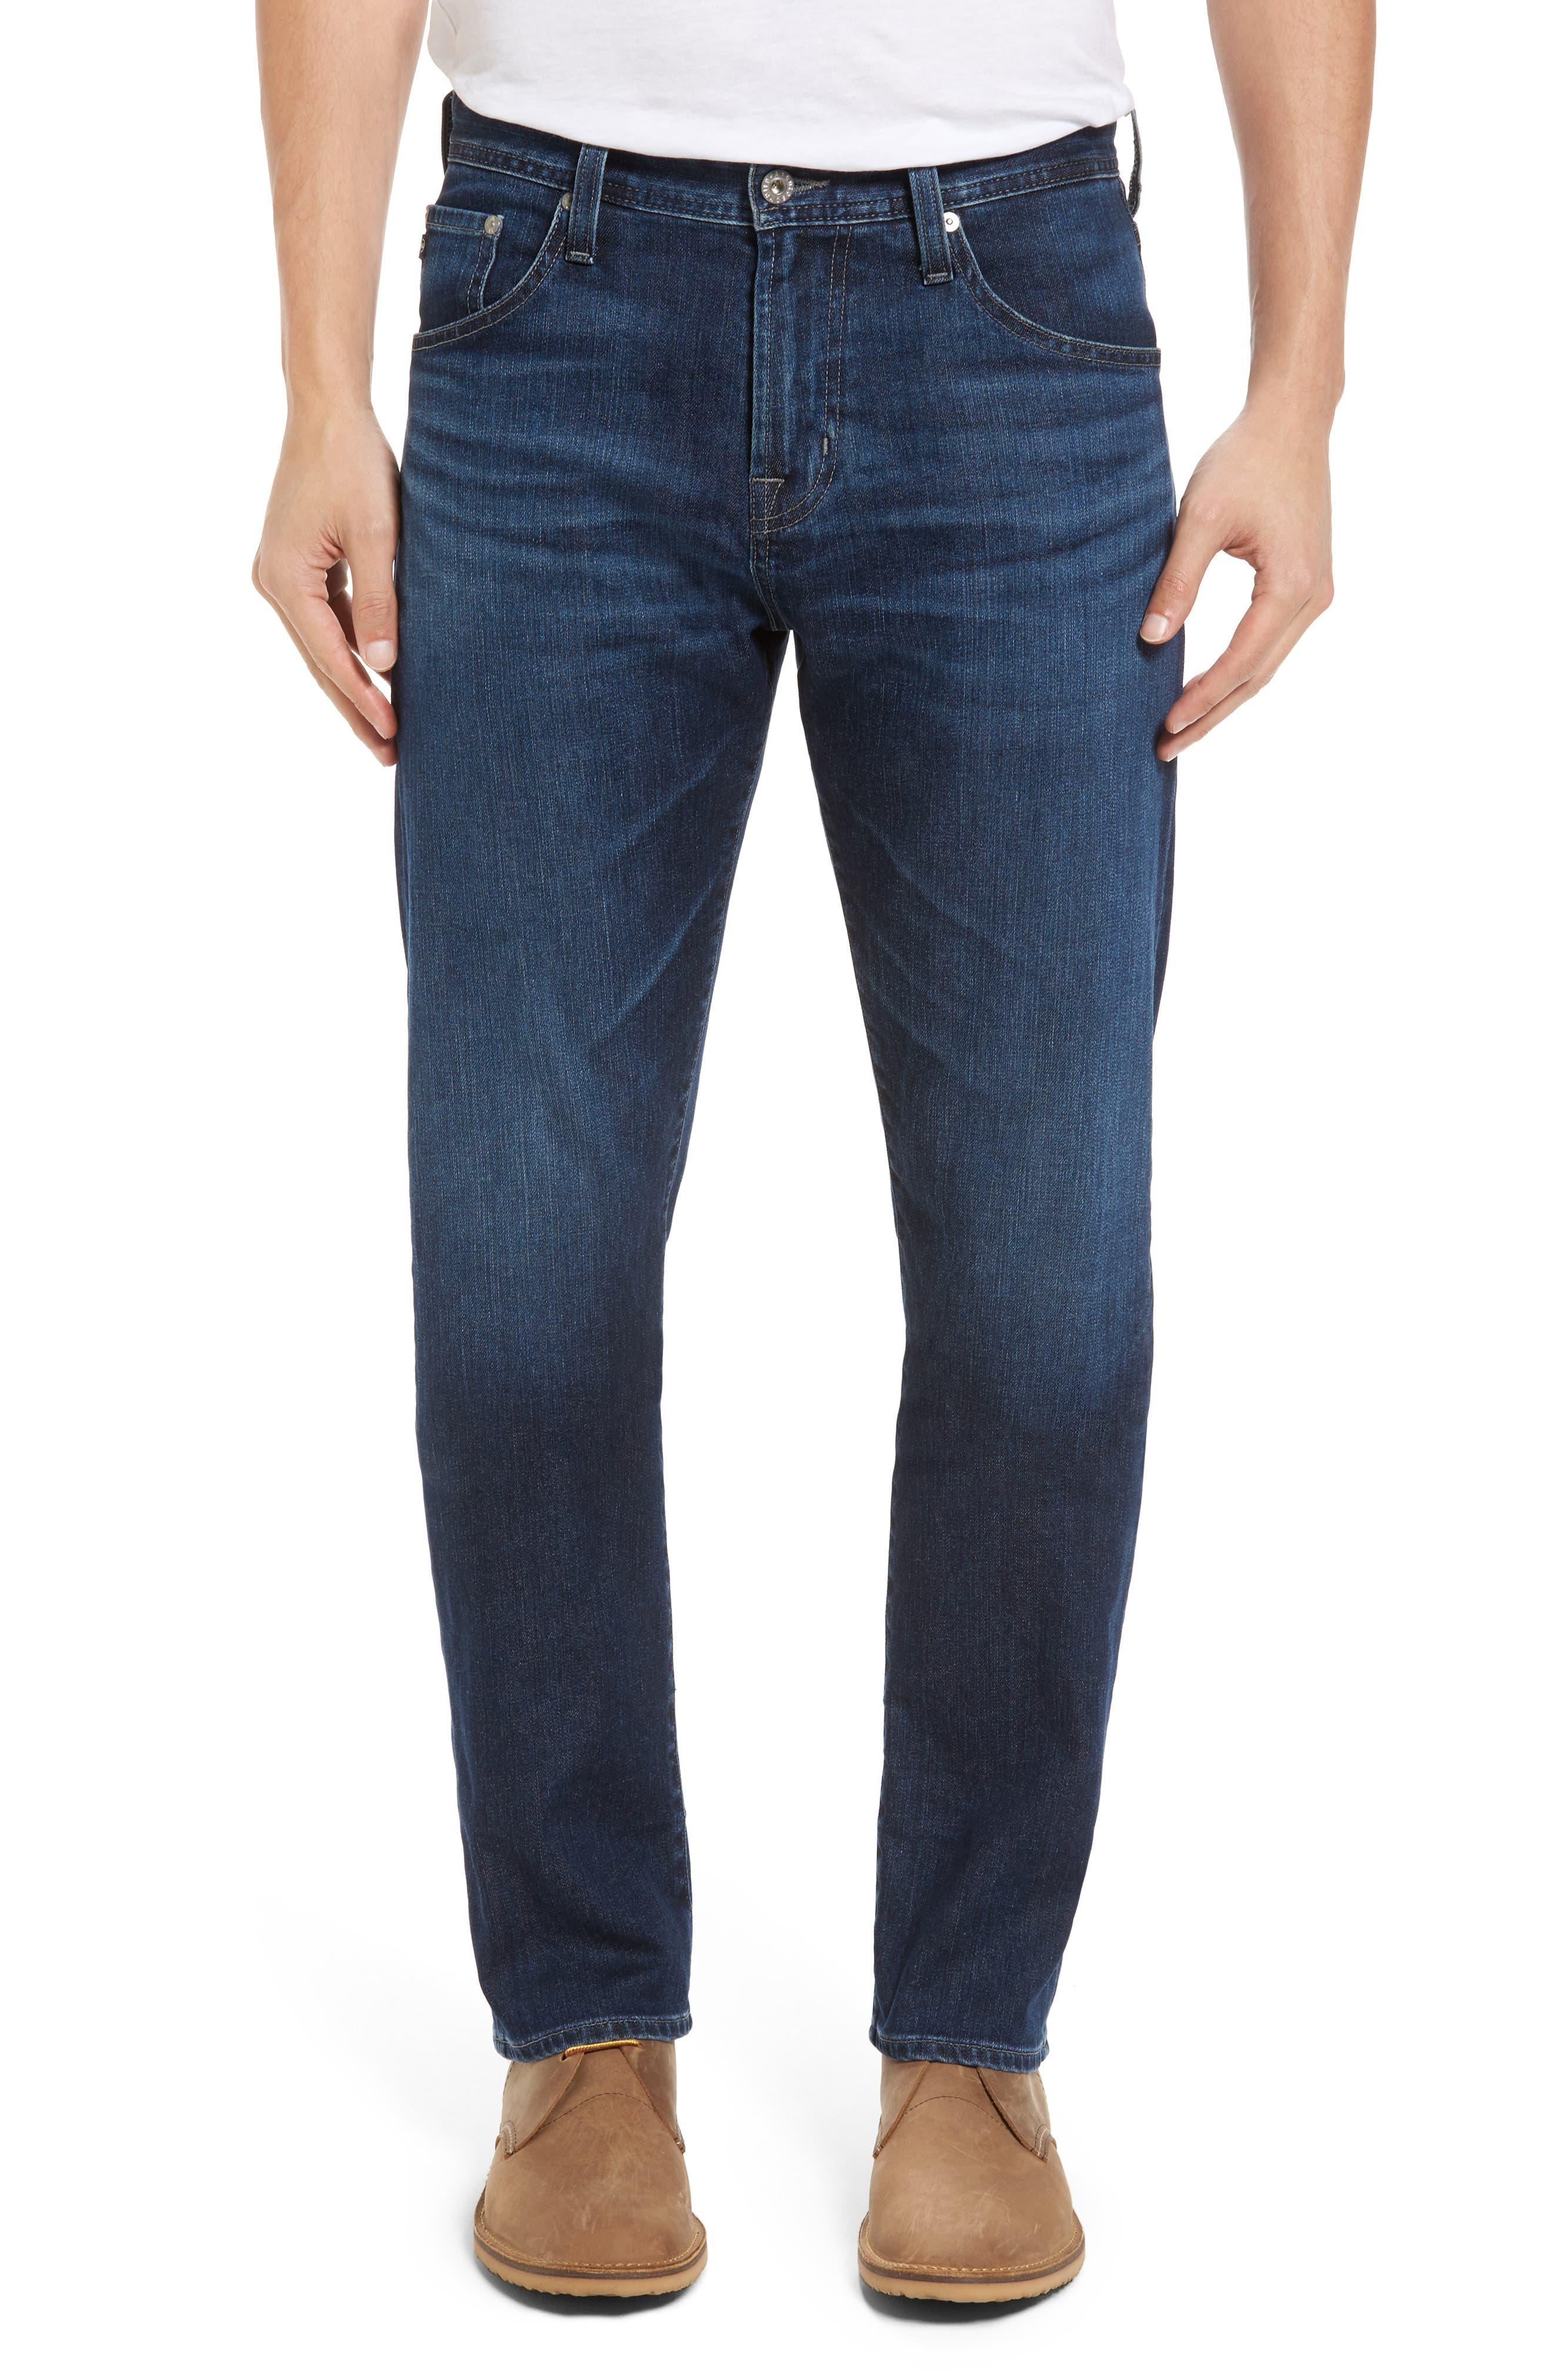 Ives Straight Leg Jeans,                             Main thumbnail 1, color,                             438